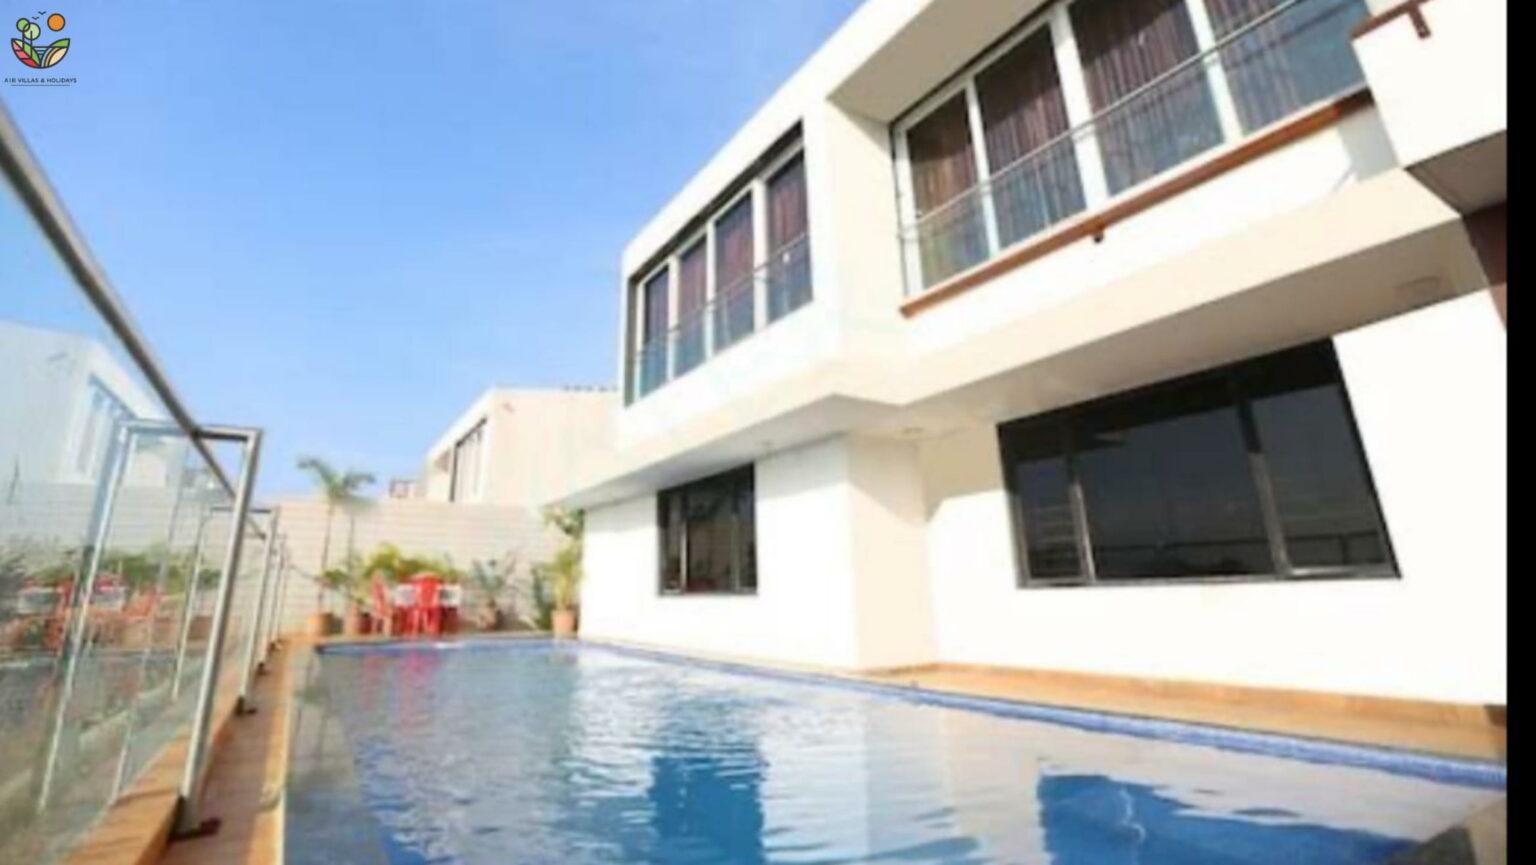 5bhk villas in igatpuri